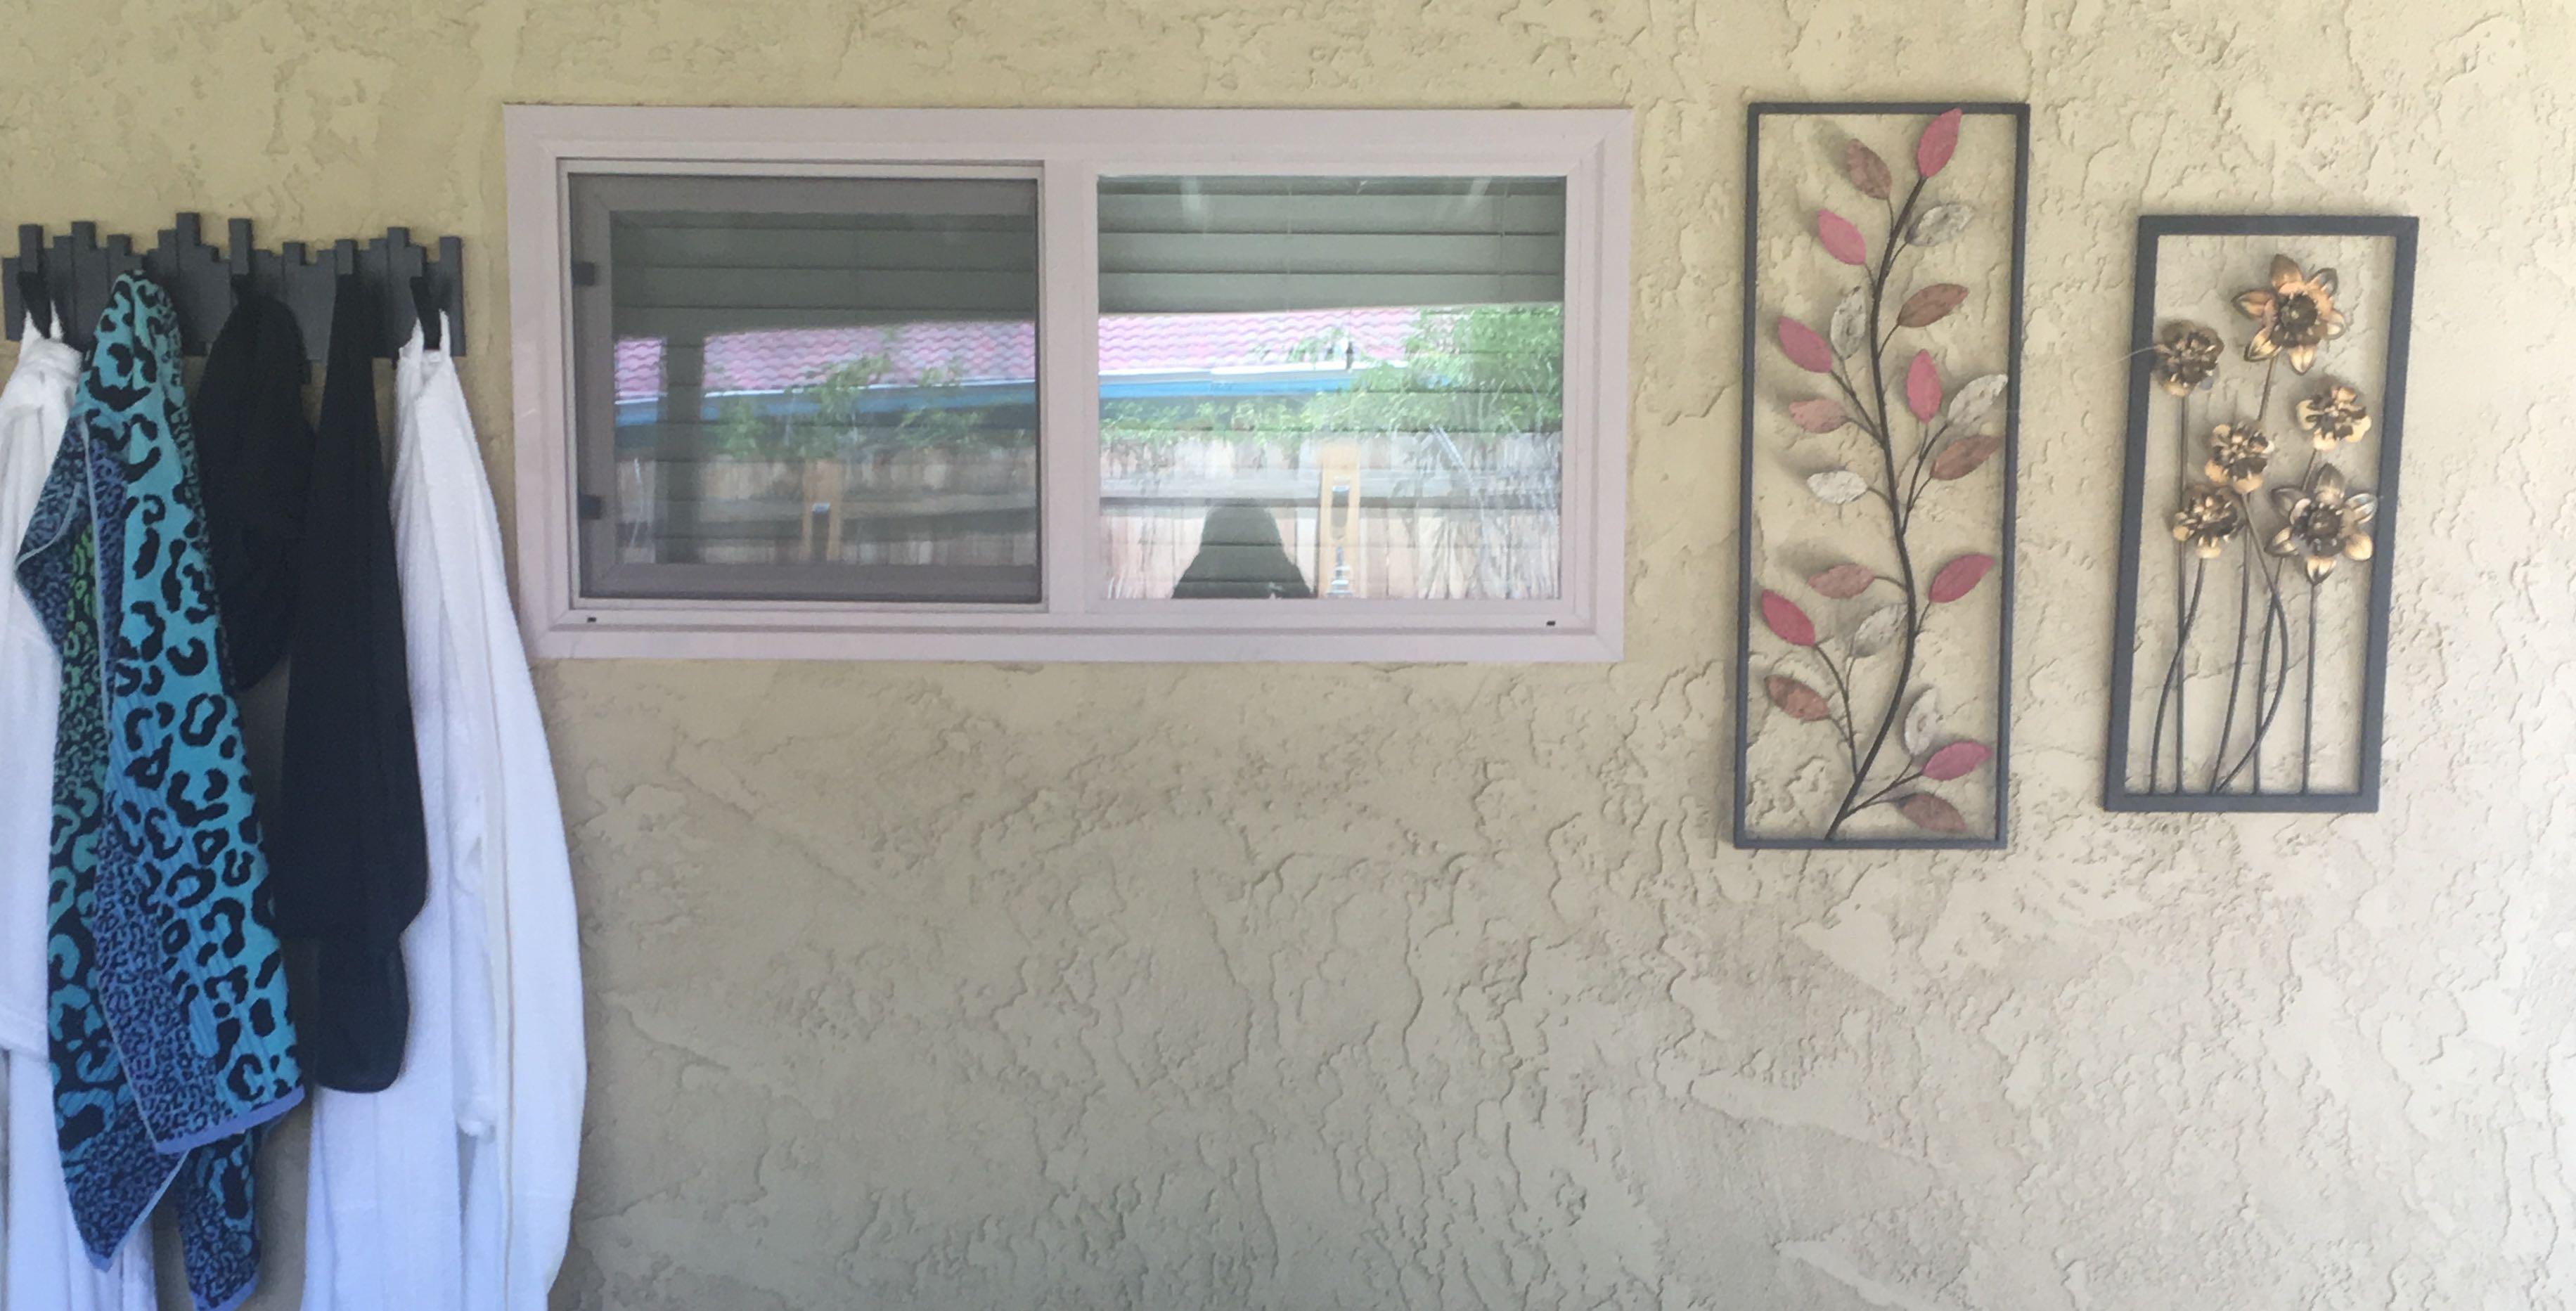 Outdoor Living Spaces | Popupbackpacker Within Burlington Coat Factory Wall Art (View 13 of 20)